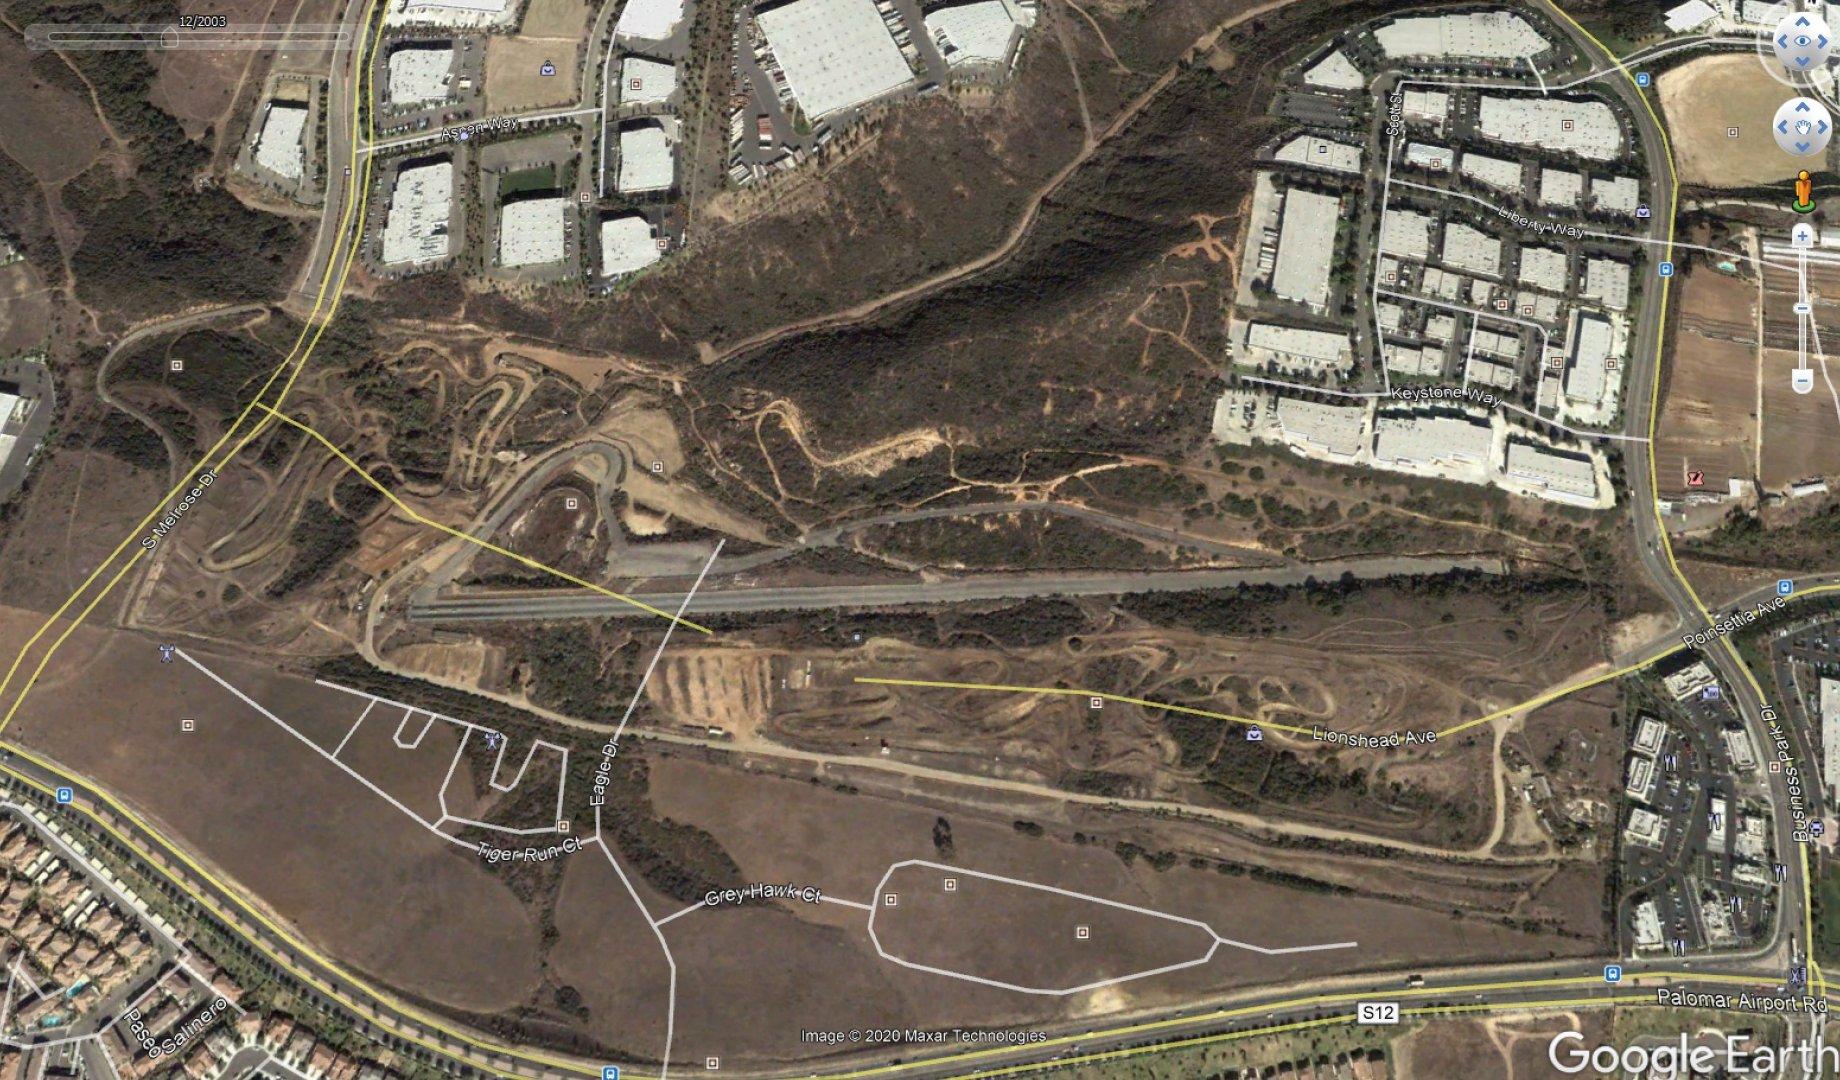 Carlsbad Raceway Google Earth 12-2003.JPG